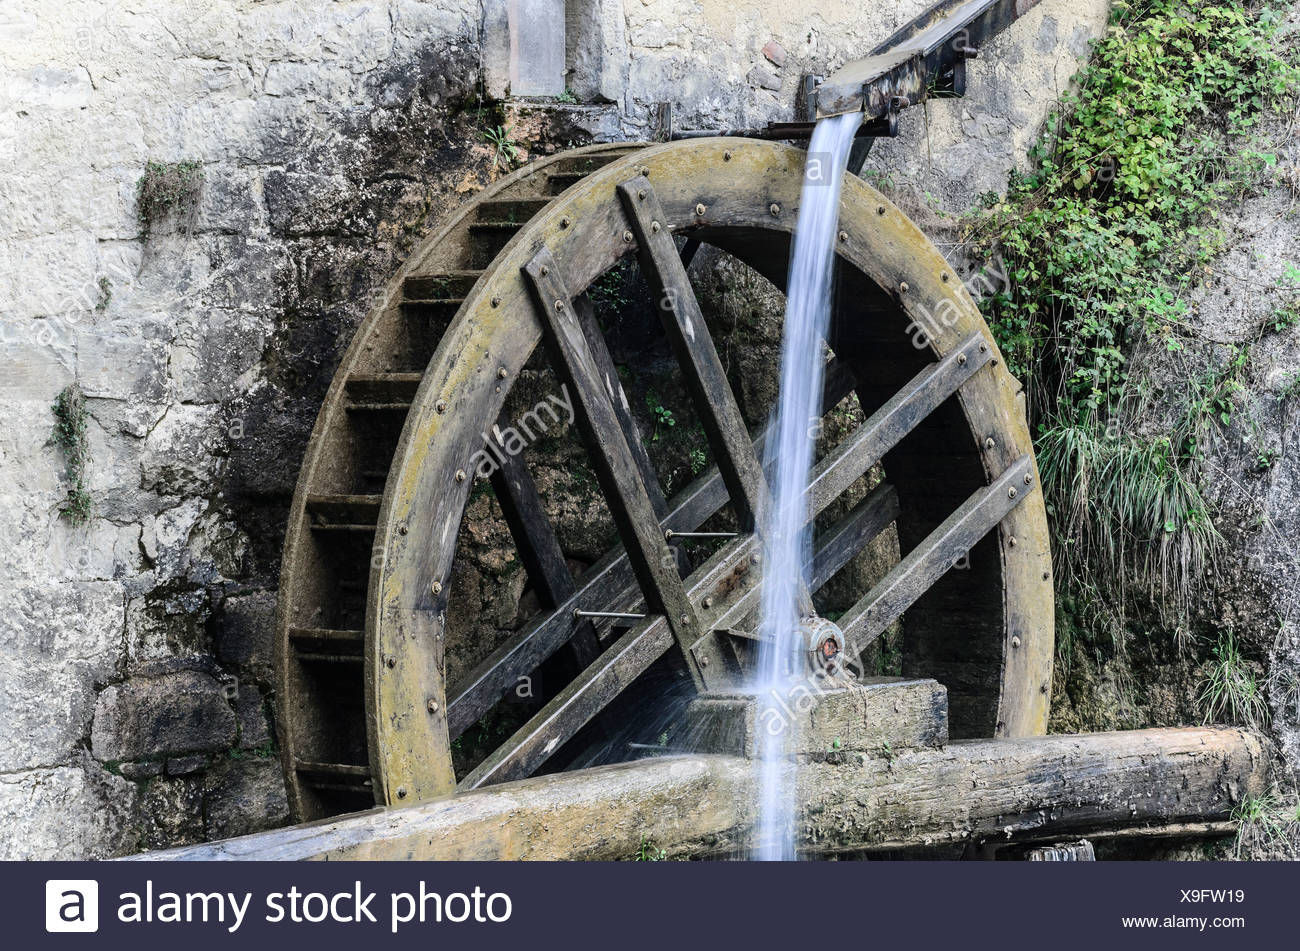 Water wheel of the Mulinetto della Croda mill, restaurant, northern Italy, Europe - Stock Image